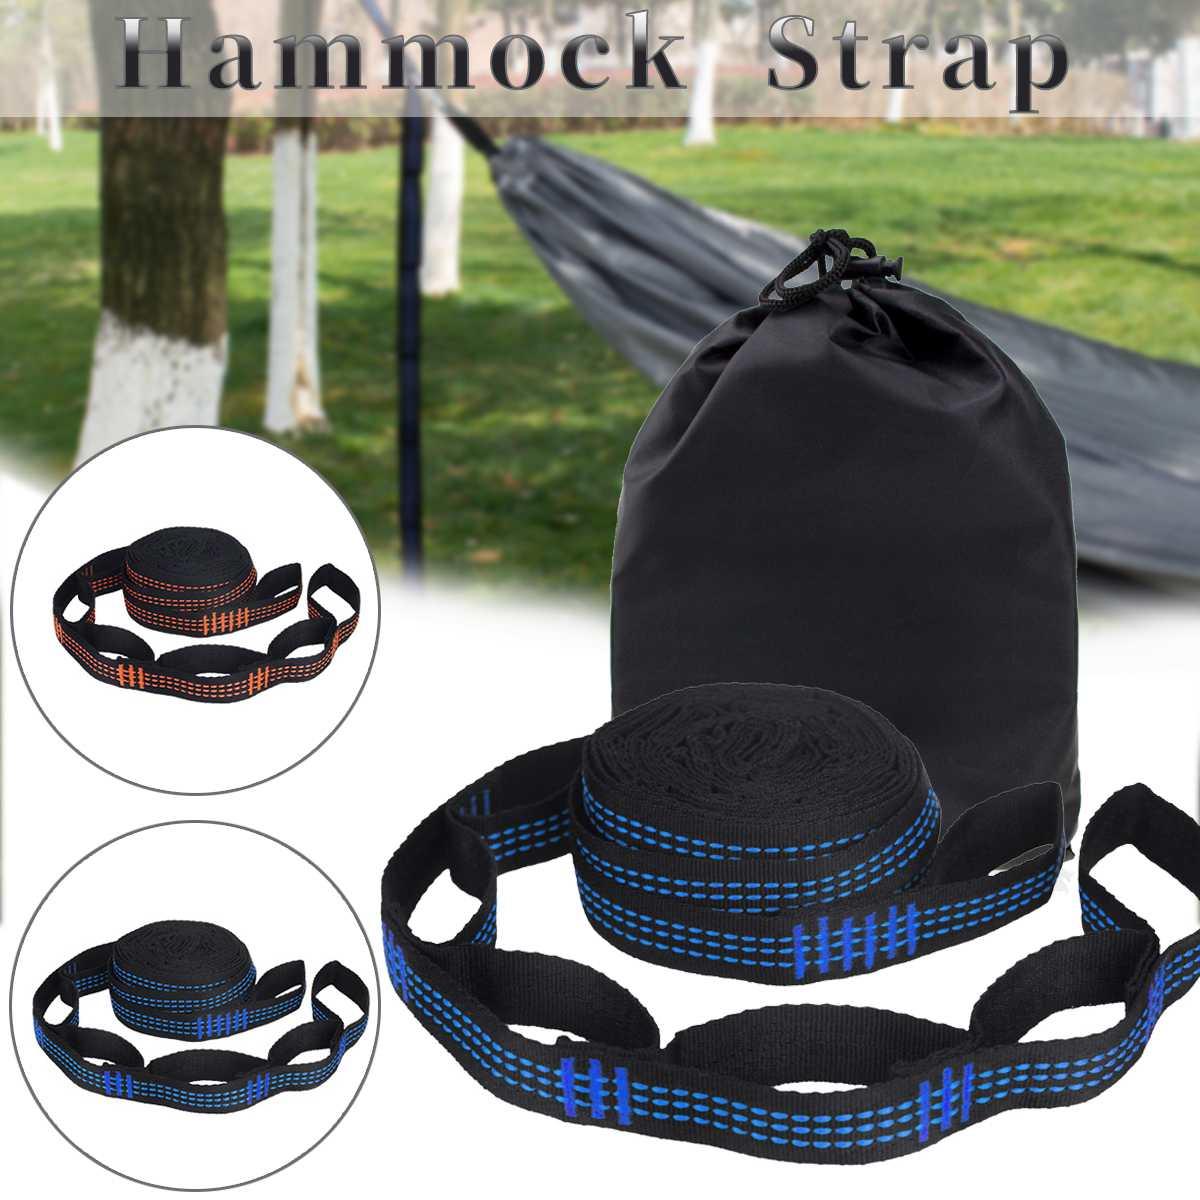 2Pcs Hammock Strap 200Cm Tree Hanging Spare Part Outdoor Aerial Yoga 600Kg Load Portable Outdoor Camping Hammock